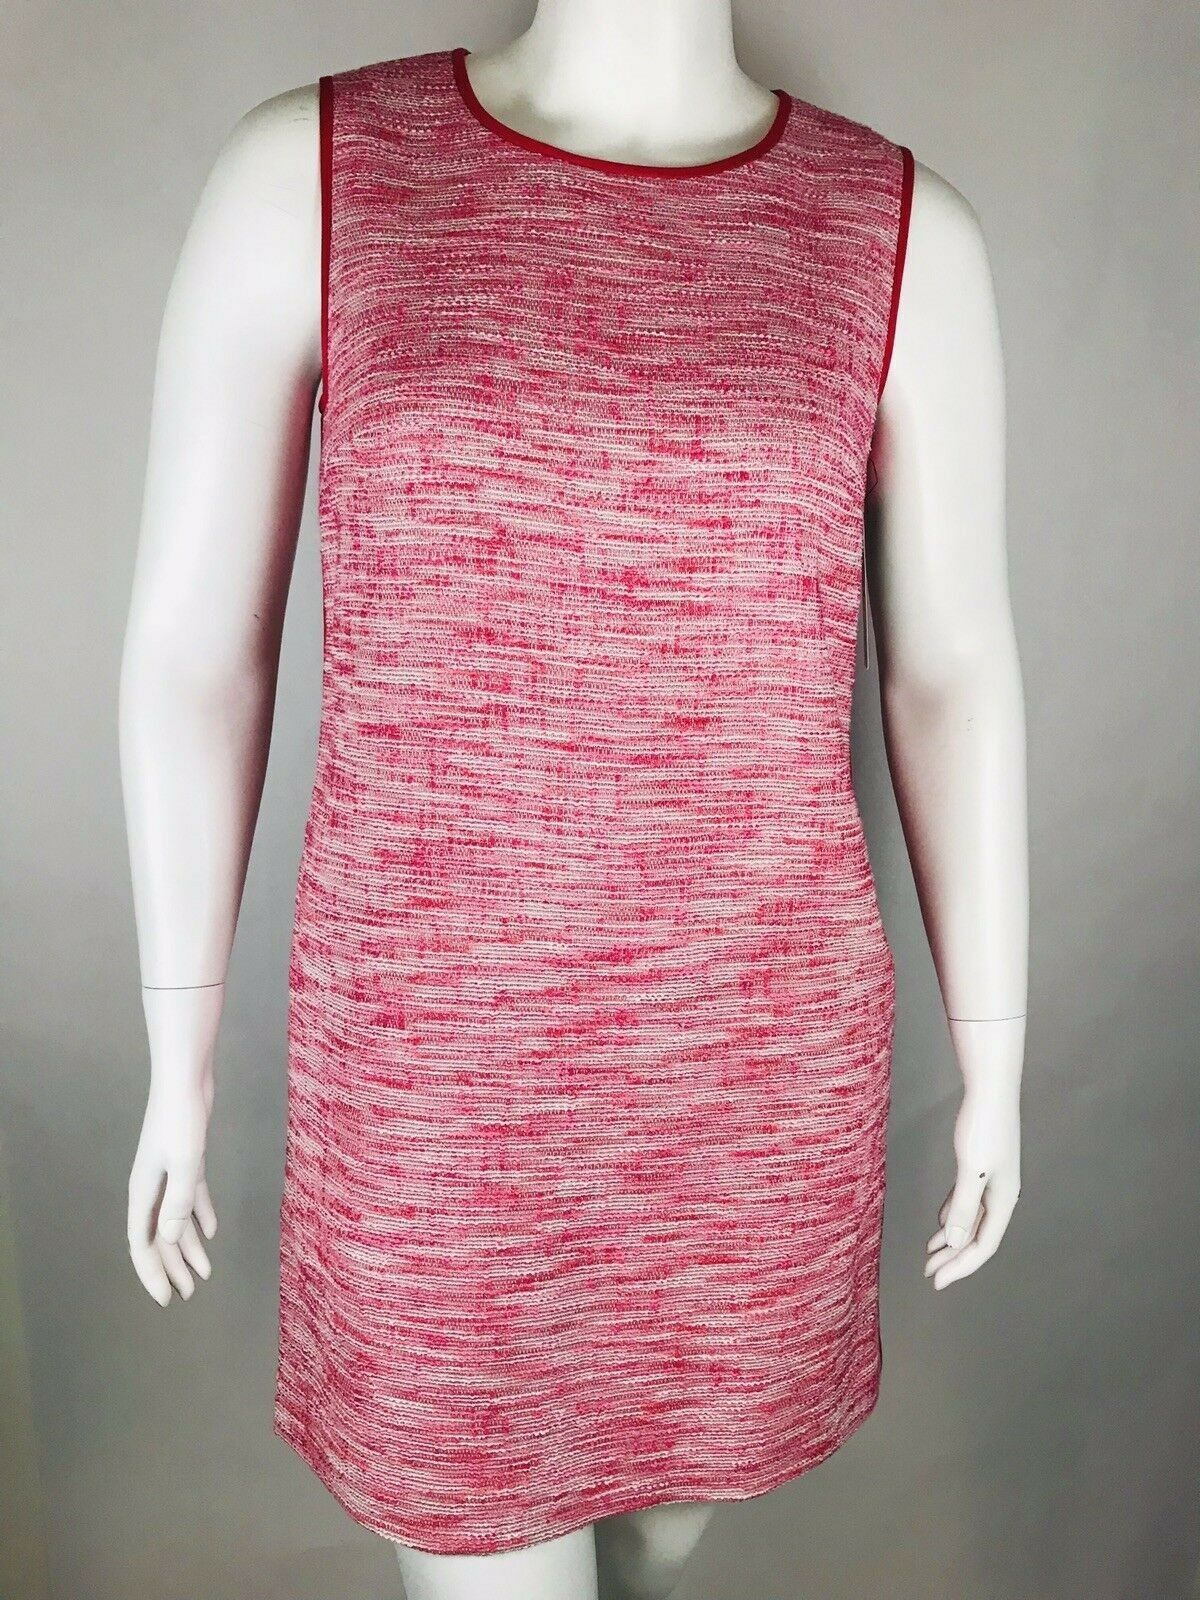 New DKNY Womans Runway Sleeveless Bloom Tweed Shift Sleeveless Dress Sz 14 NWT